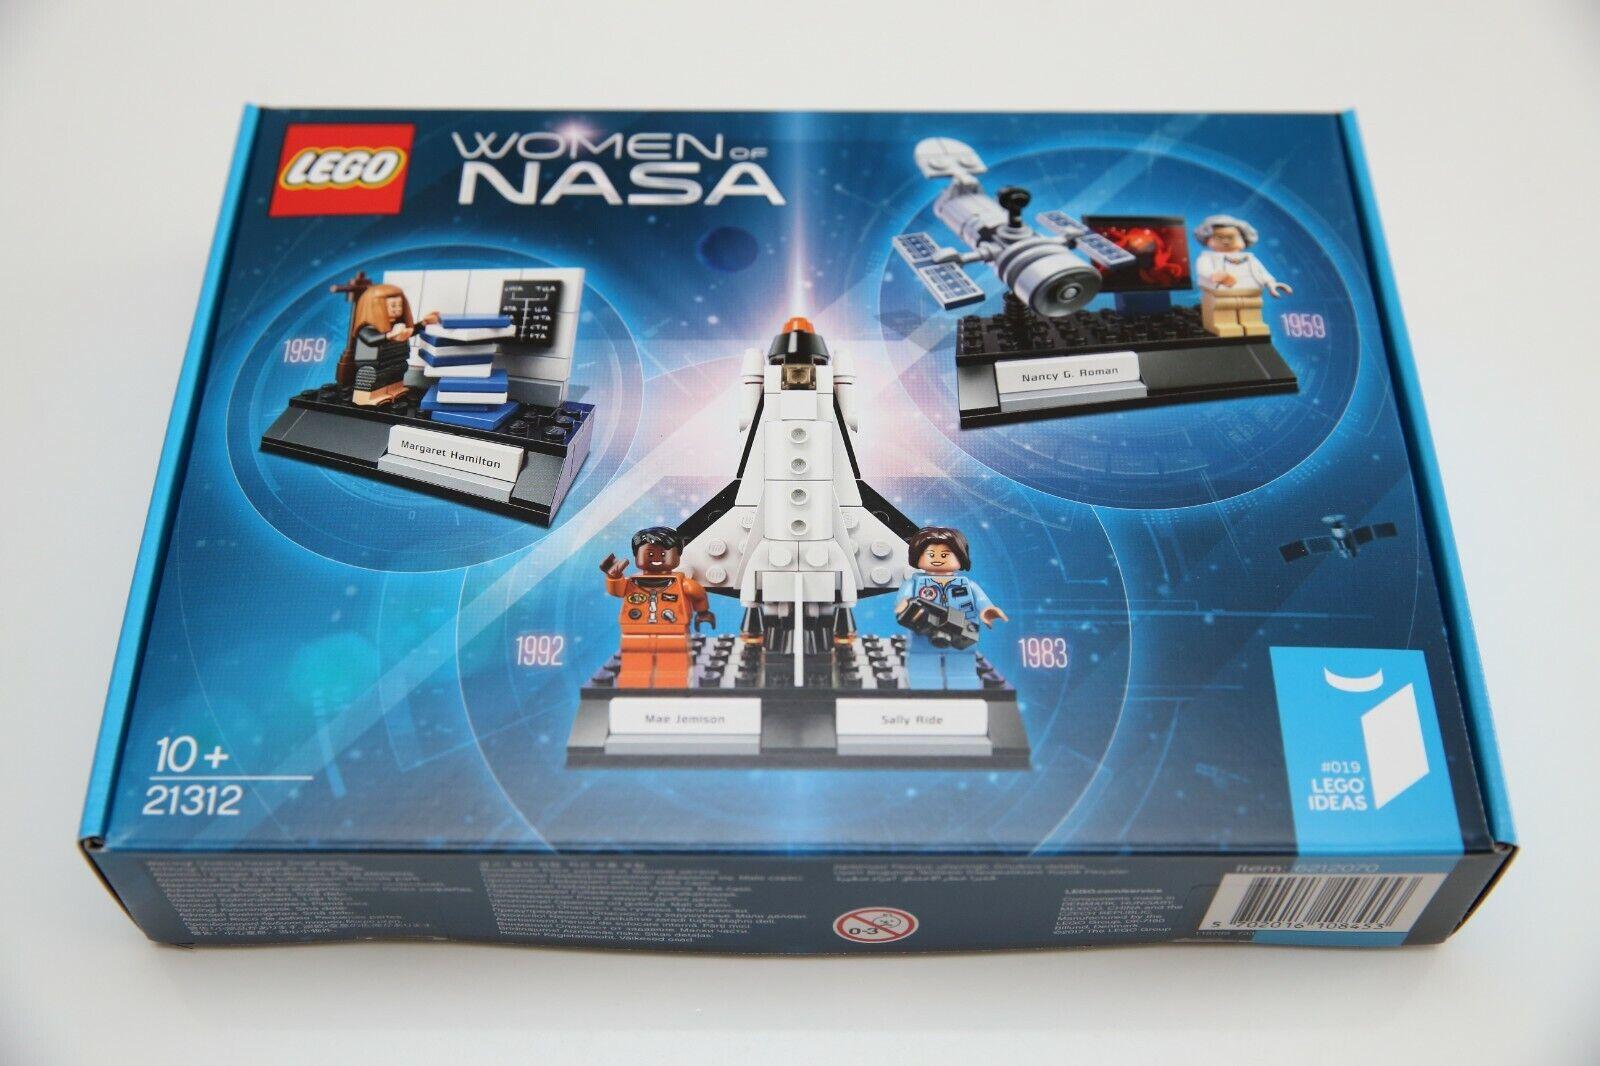 LEGO 21312 Ideas Women of NASA (New & Sealed)